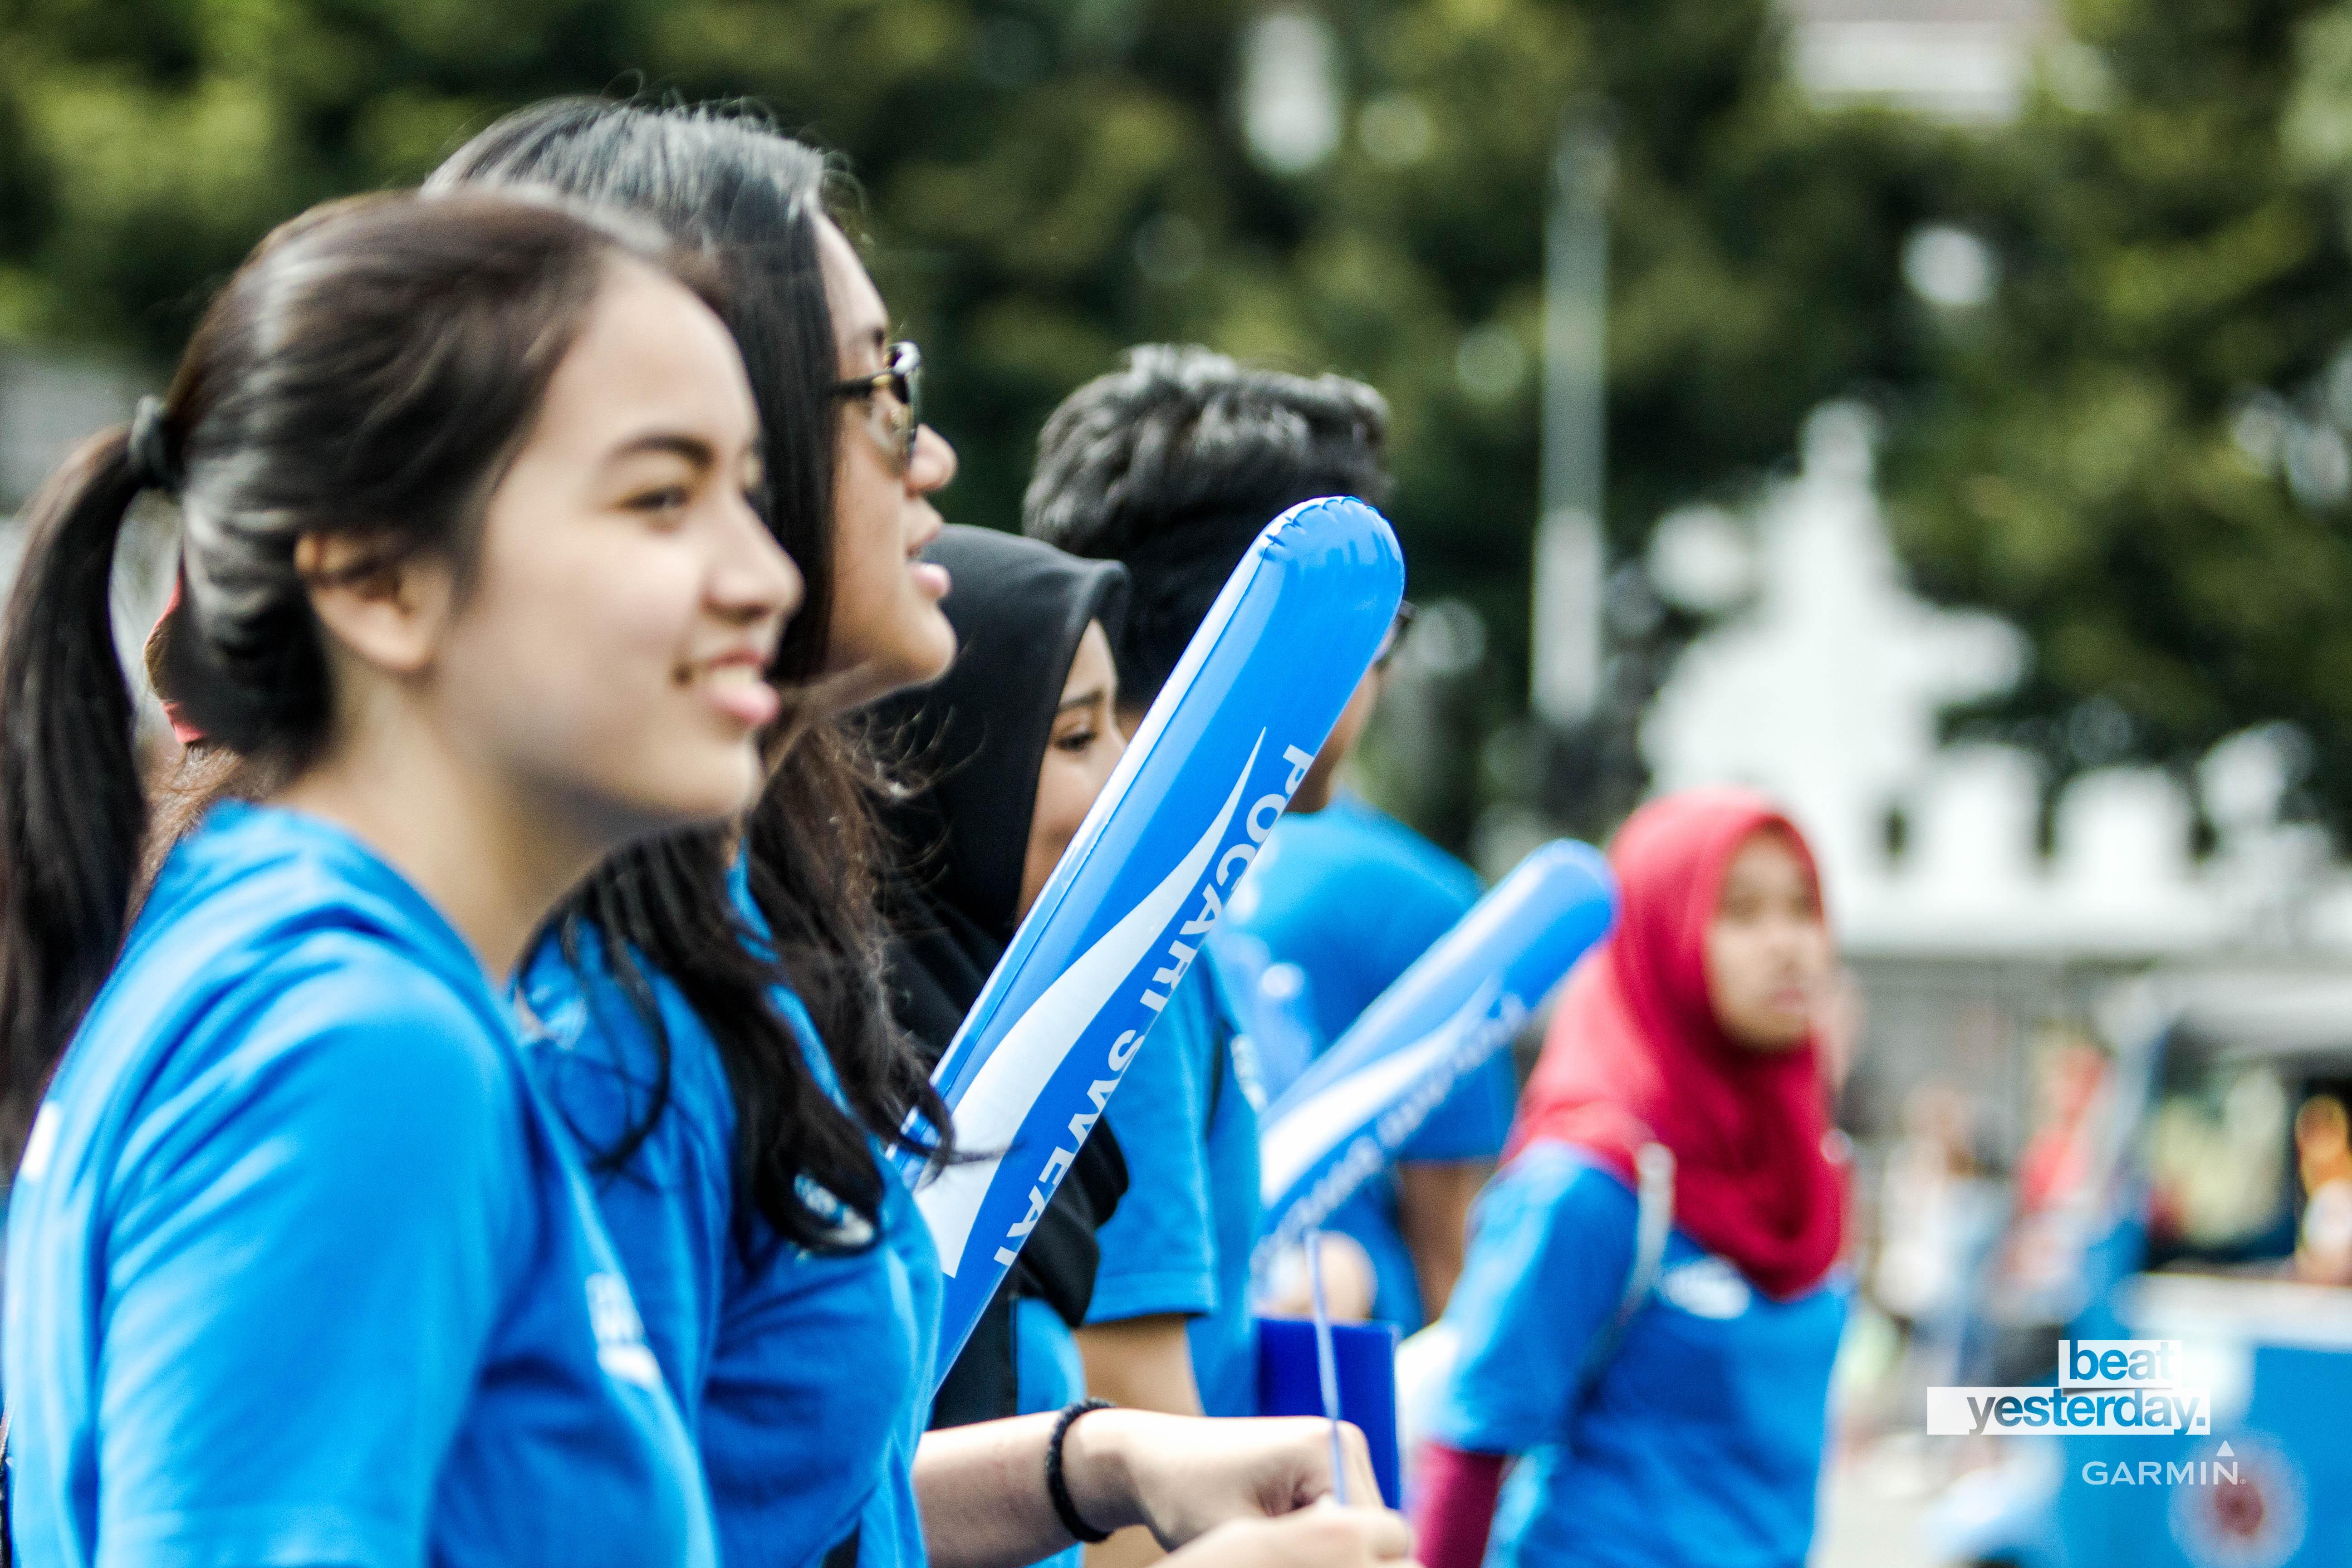 garmin indonesia fenix 3 hr pavidask